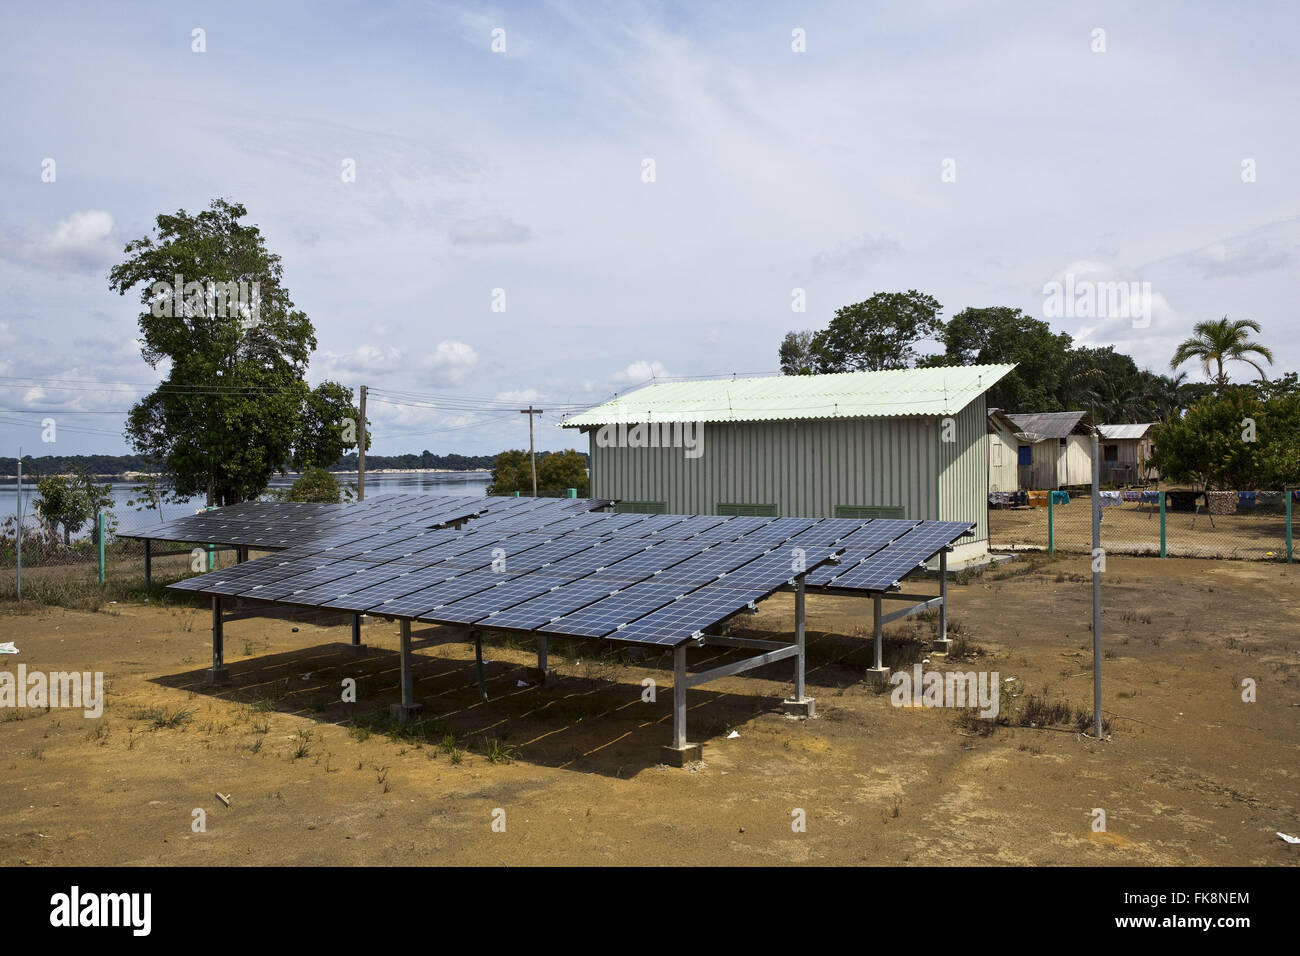 Mini plant photovoltaic - PV modules with generators blocks - community of Aracari - Stock Image